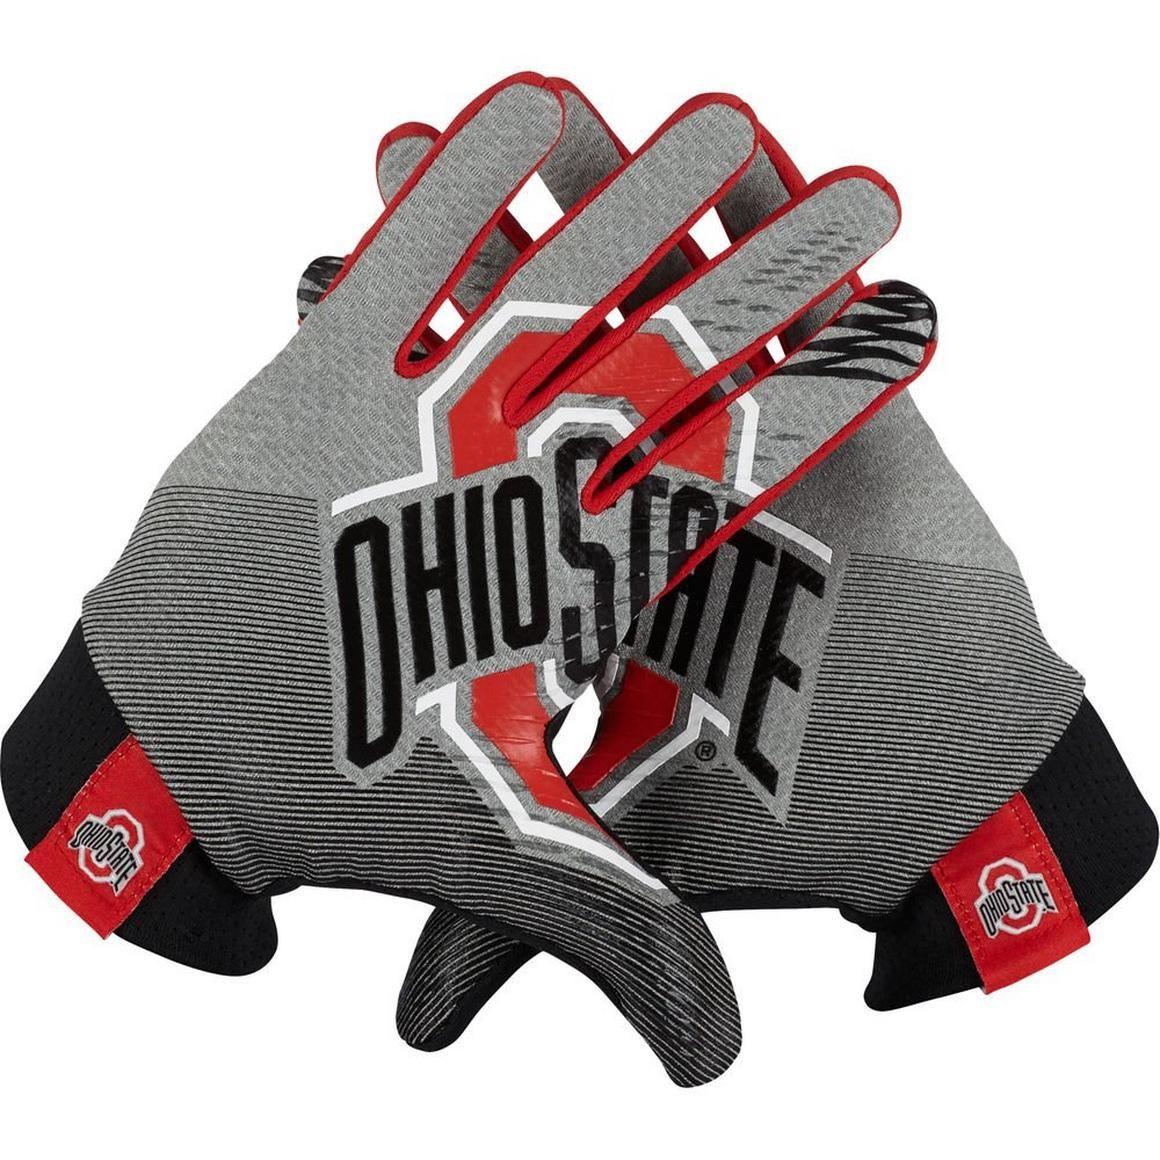 Nike Ohio State Buckeyes Stadium 2 0 Gloves Main Container Image 3 Nike Ohio State Ohio State Buckeyes Ohio State Buckeyes Gifts